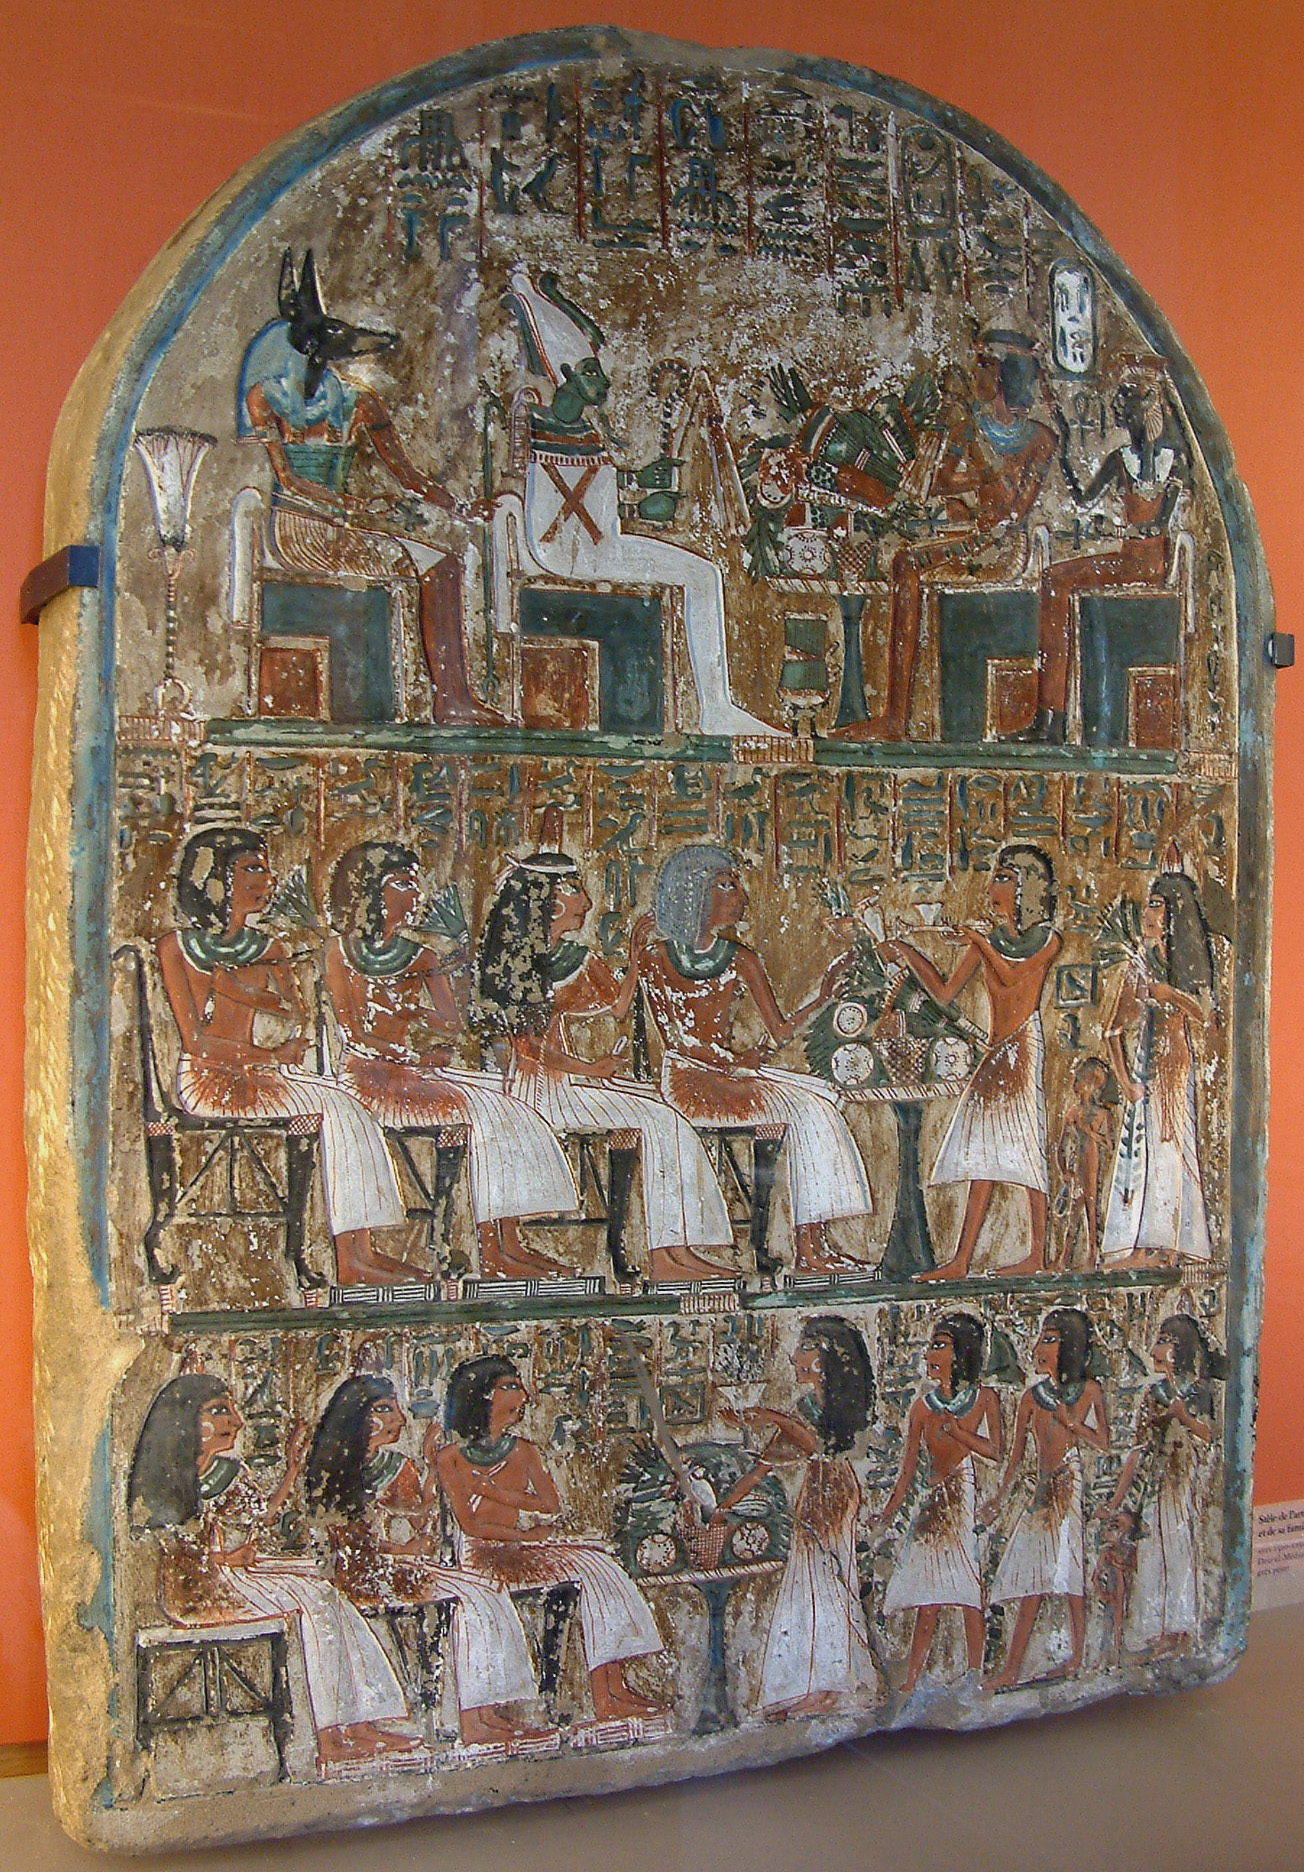 http://upload.wikimedia.org/wikipedia/commons/a/ae/Egypte_louvre_086_stele.jpg